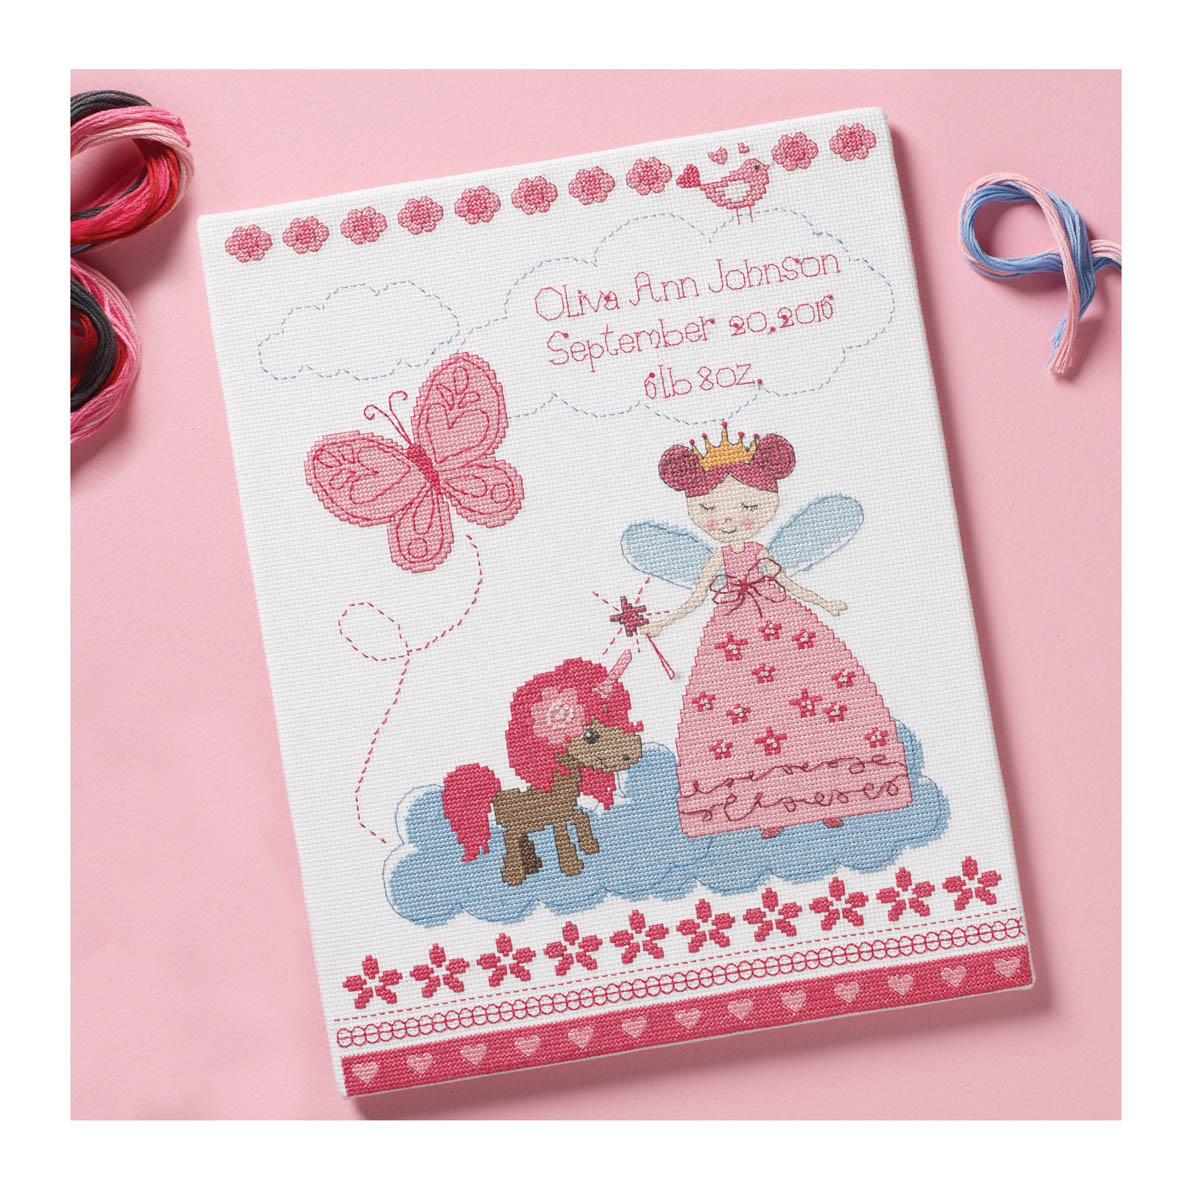 Bucilla ® Baby - Counted Cross Stitch - Crib Ensembles - Fairytale Princess - Birth Record Kit